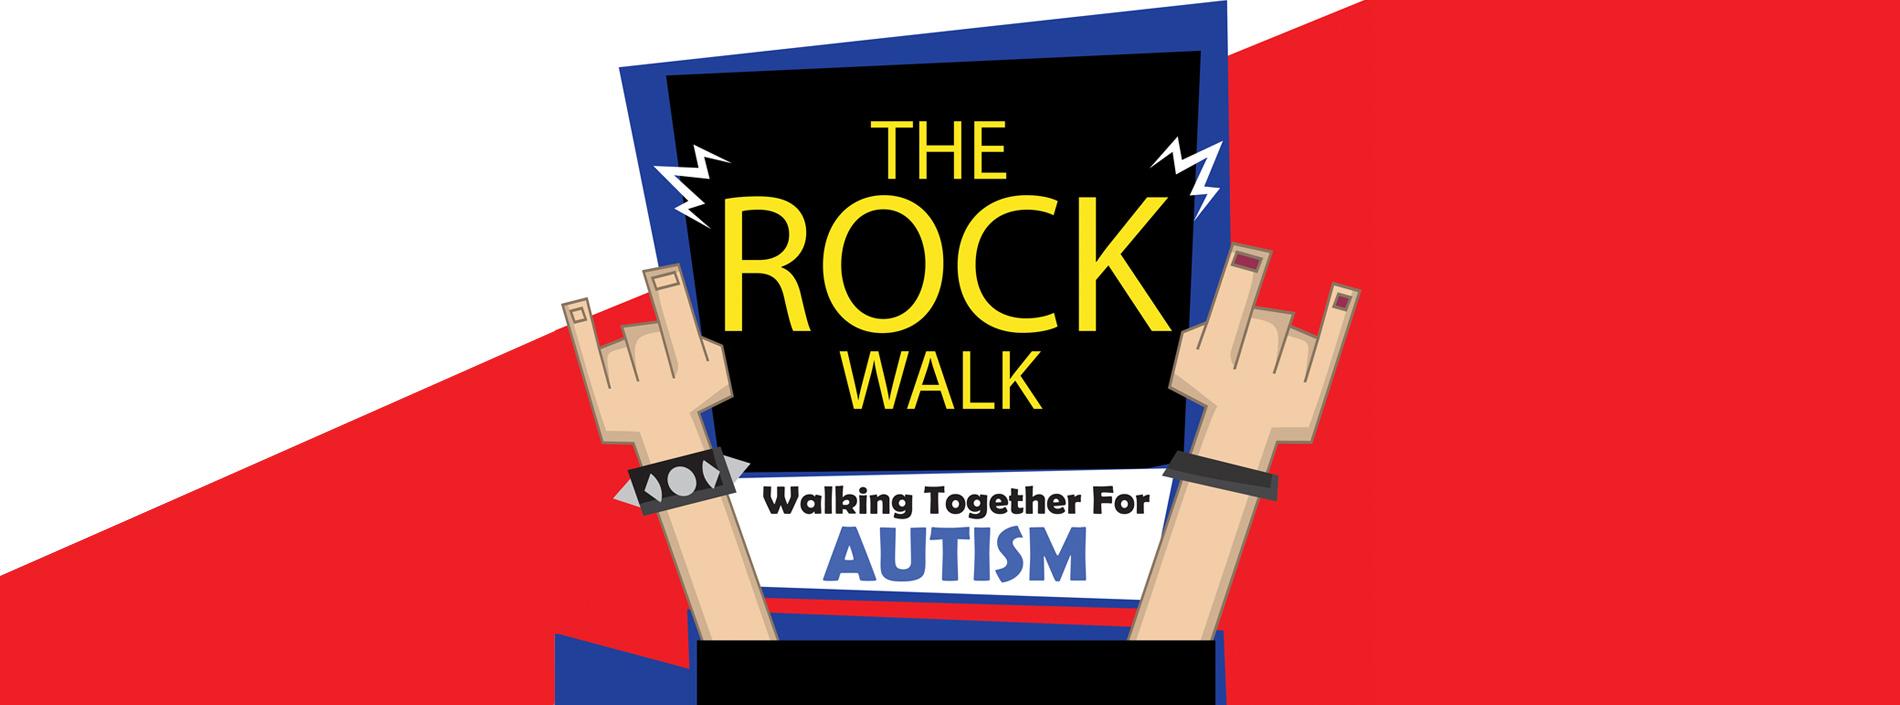 ROCK-WALK-banner